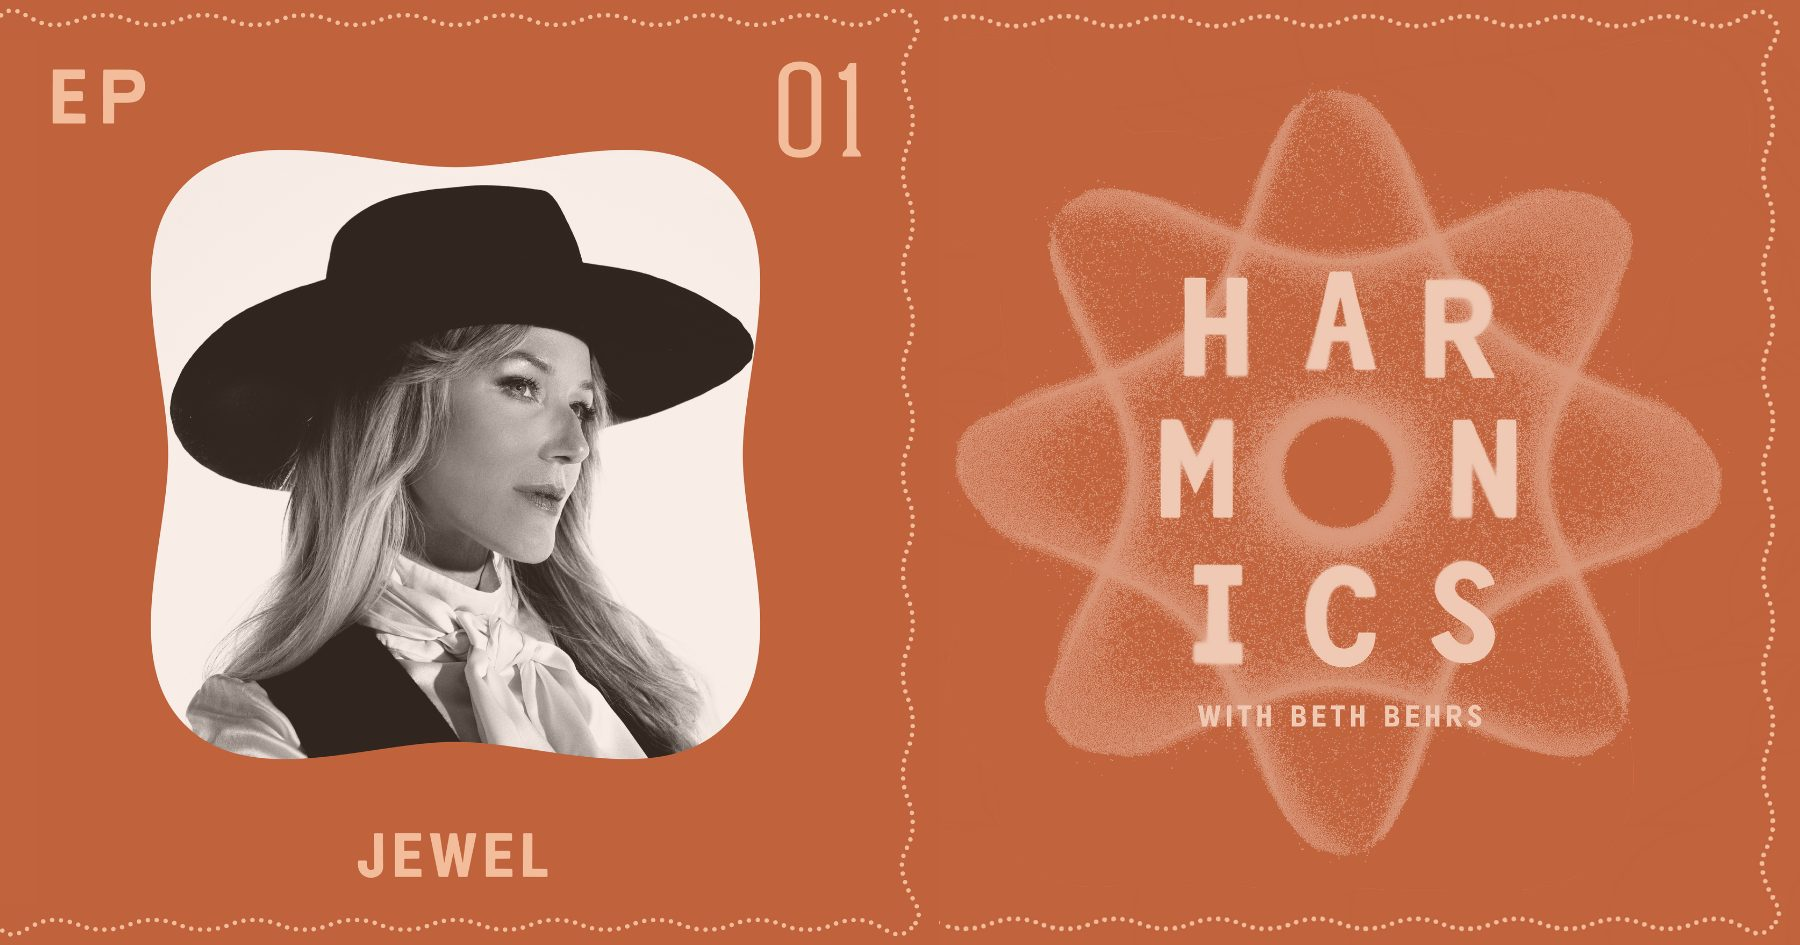 Harmonics with Beth Behrs: Jewel